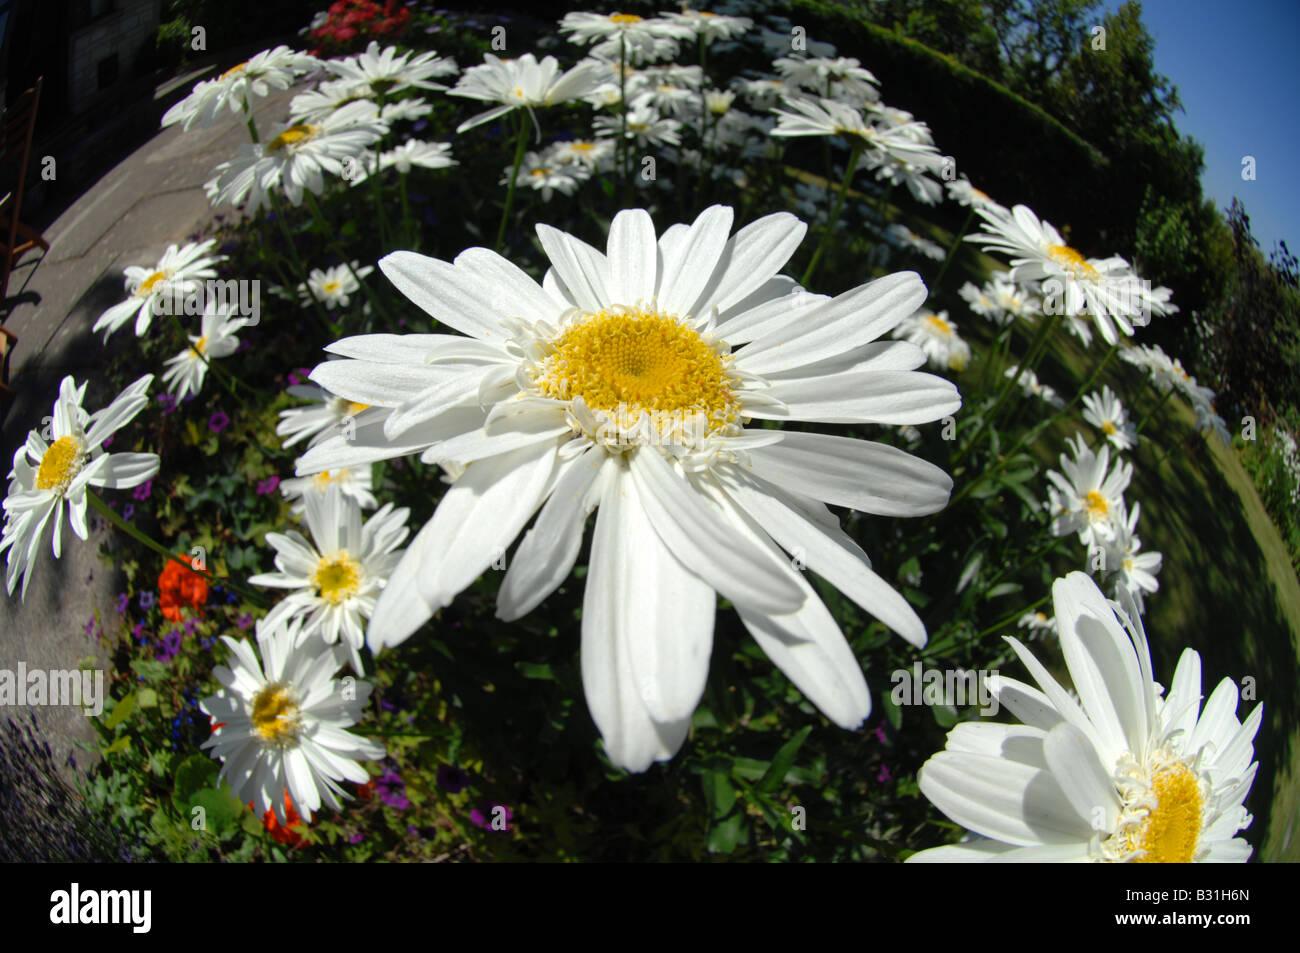 Beautiful Flowers 2019 Giant Daisy Flower Beautiful Flowers